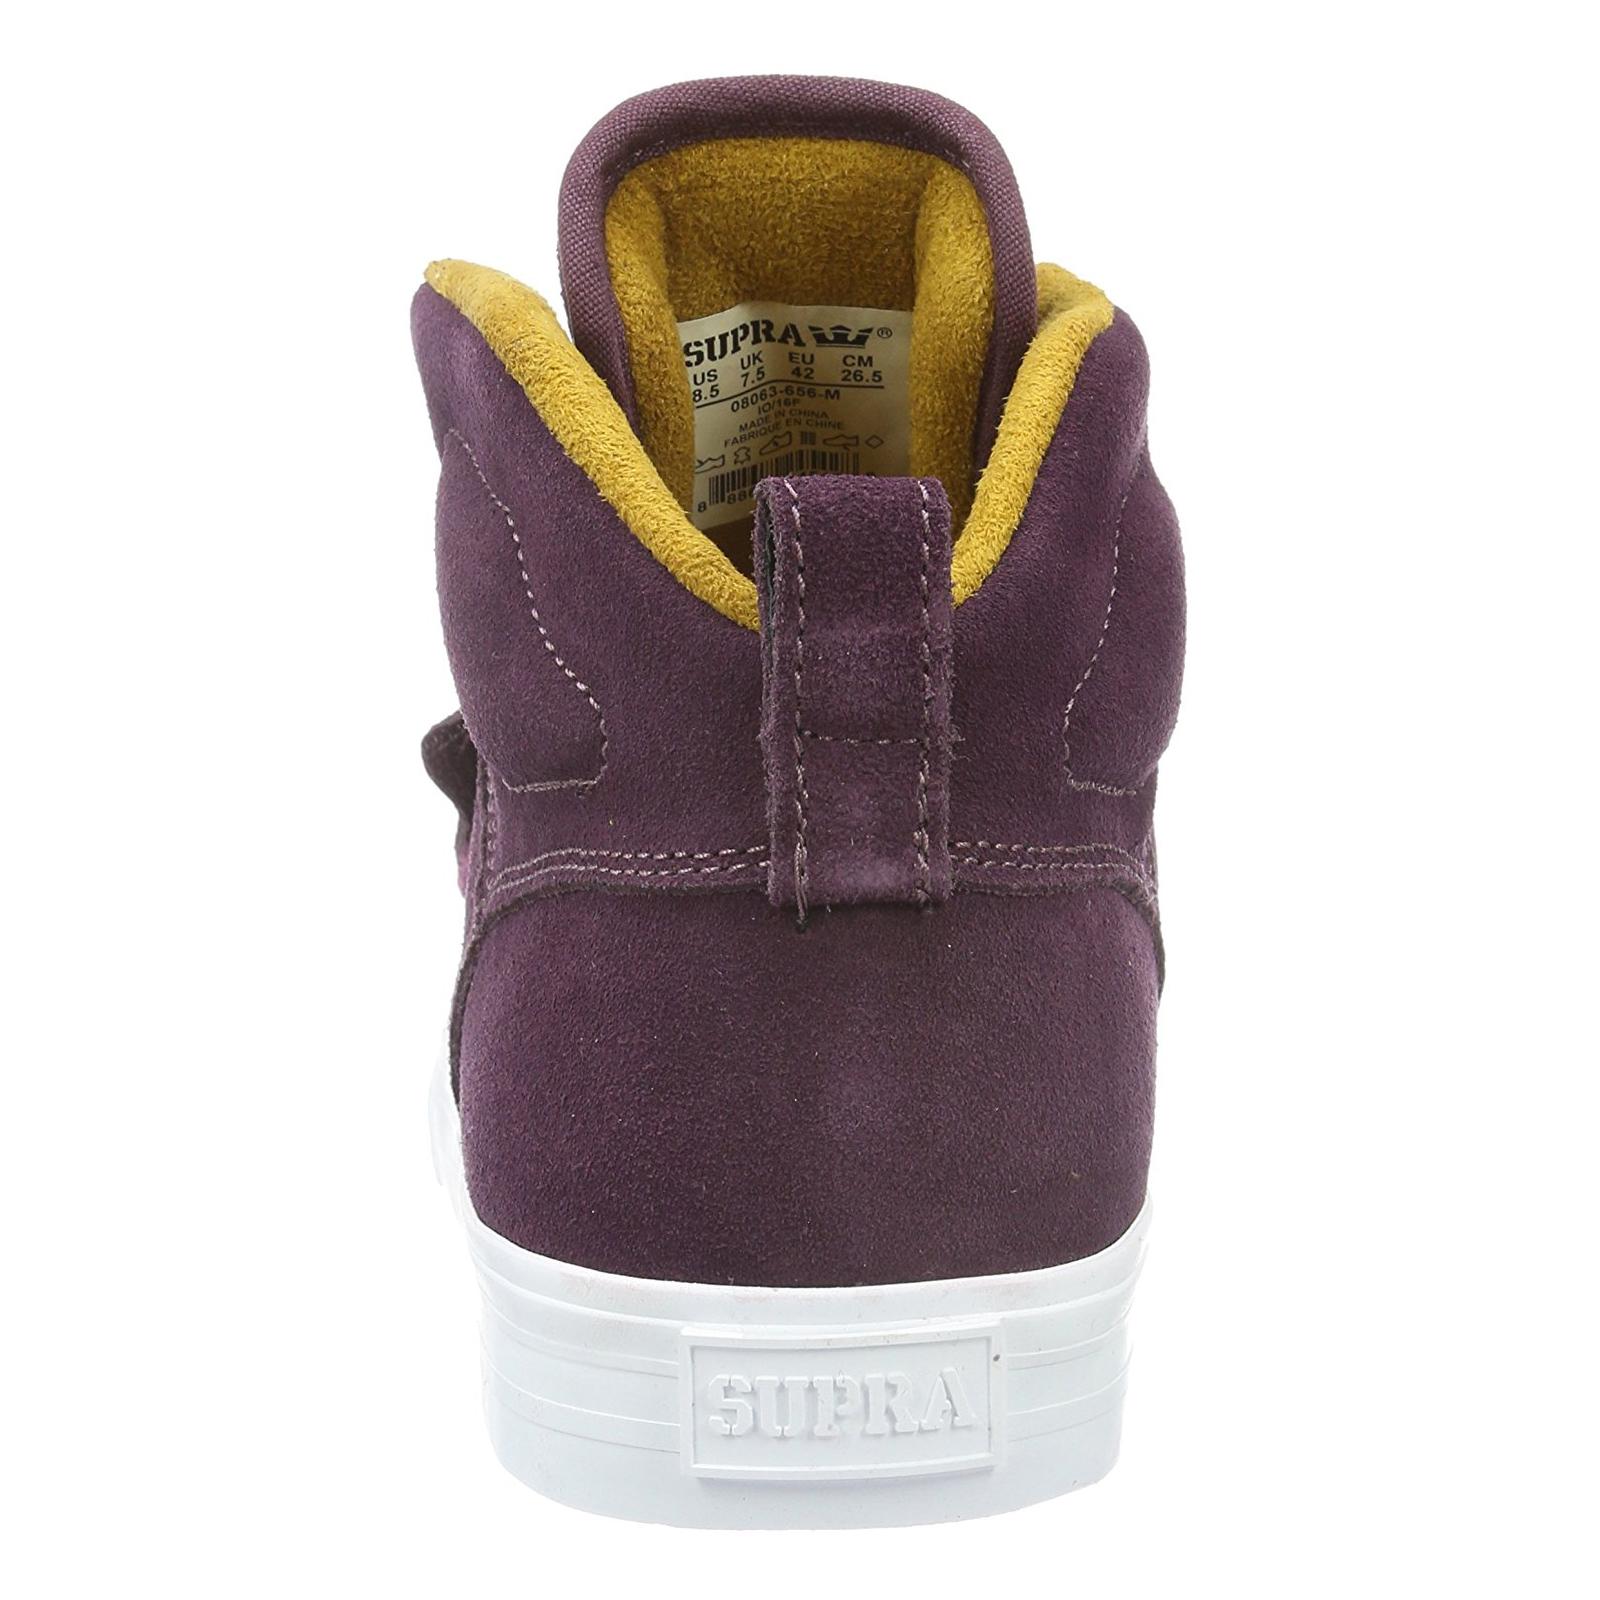 Estate Burgundy Sneakers Supra blanc Rock or Viola gnwfSq68x